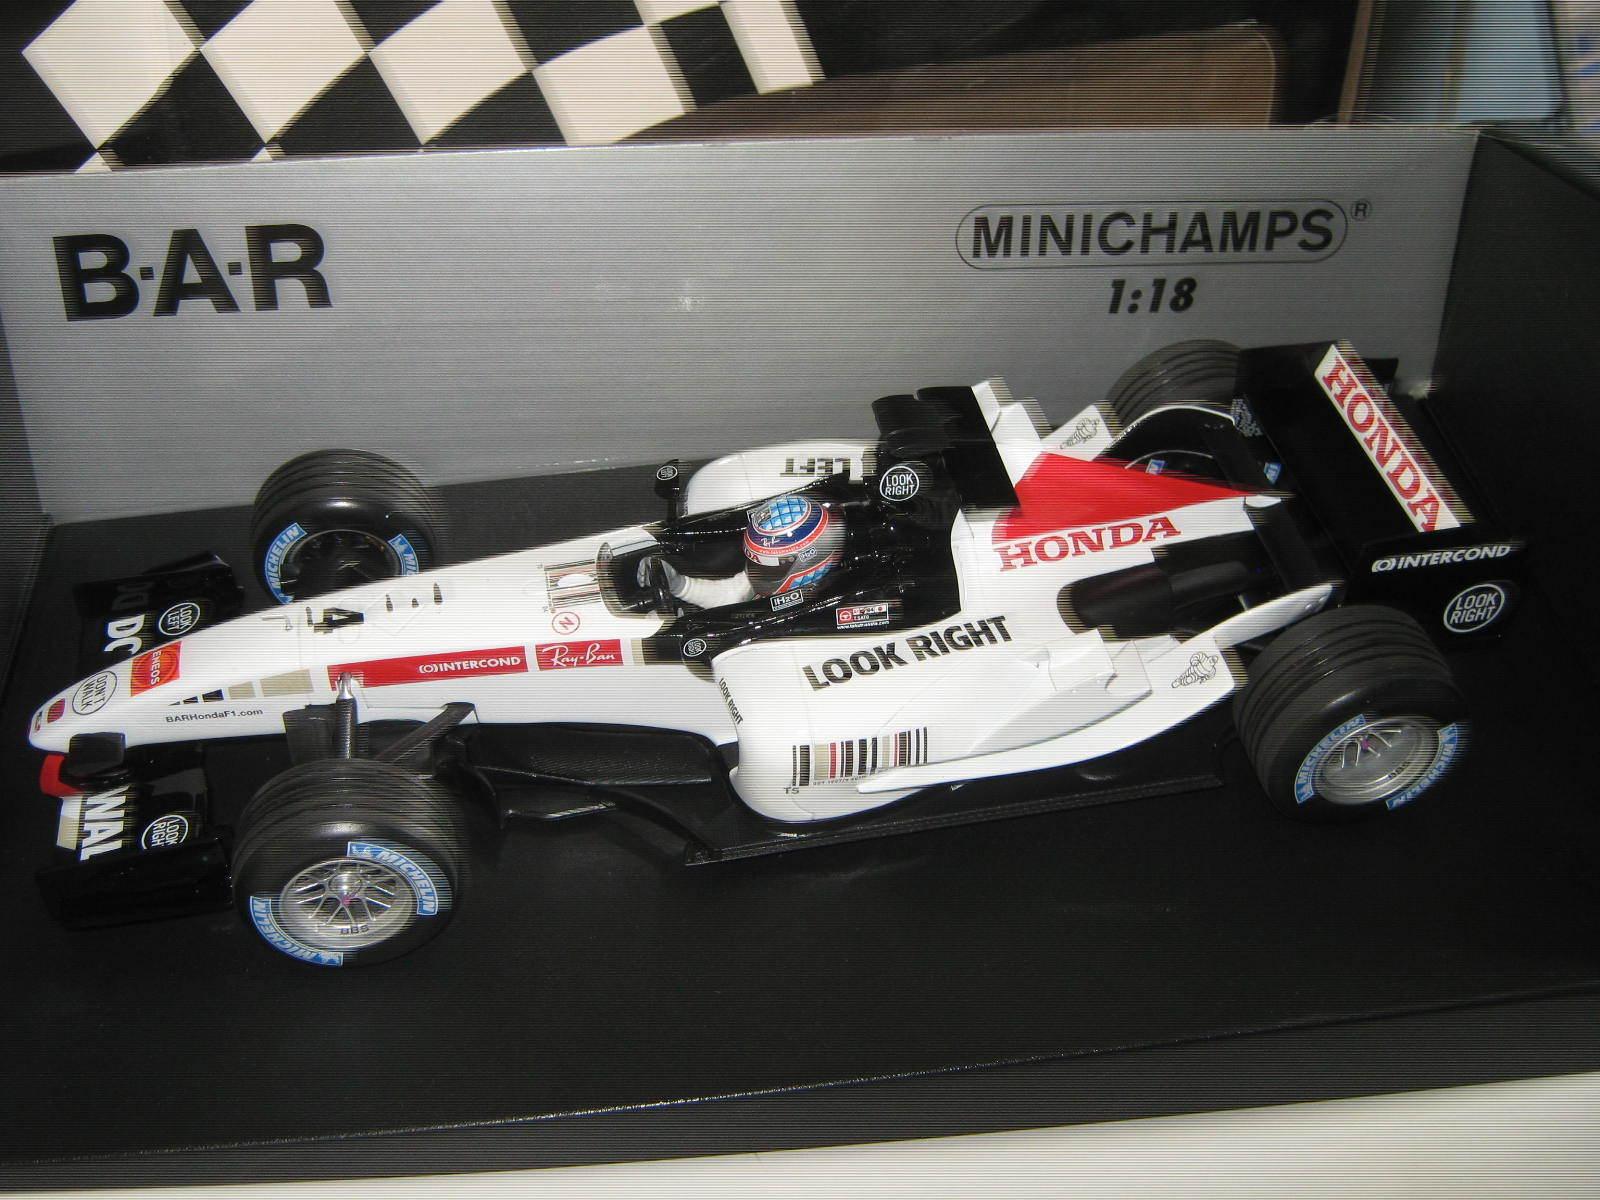 1 18 Bar Honda 007 2005 T Sato (JP) 100050004 MINICHAMPS neuf neuf dans sa boîte